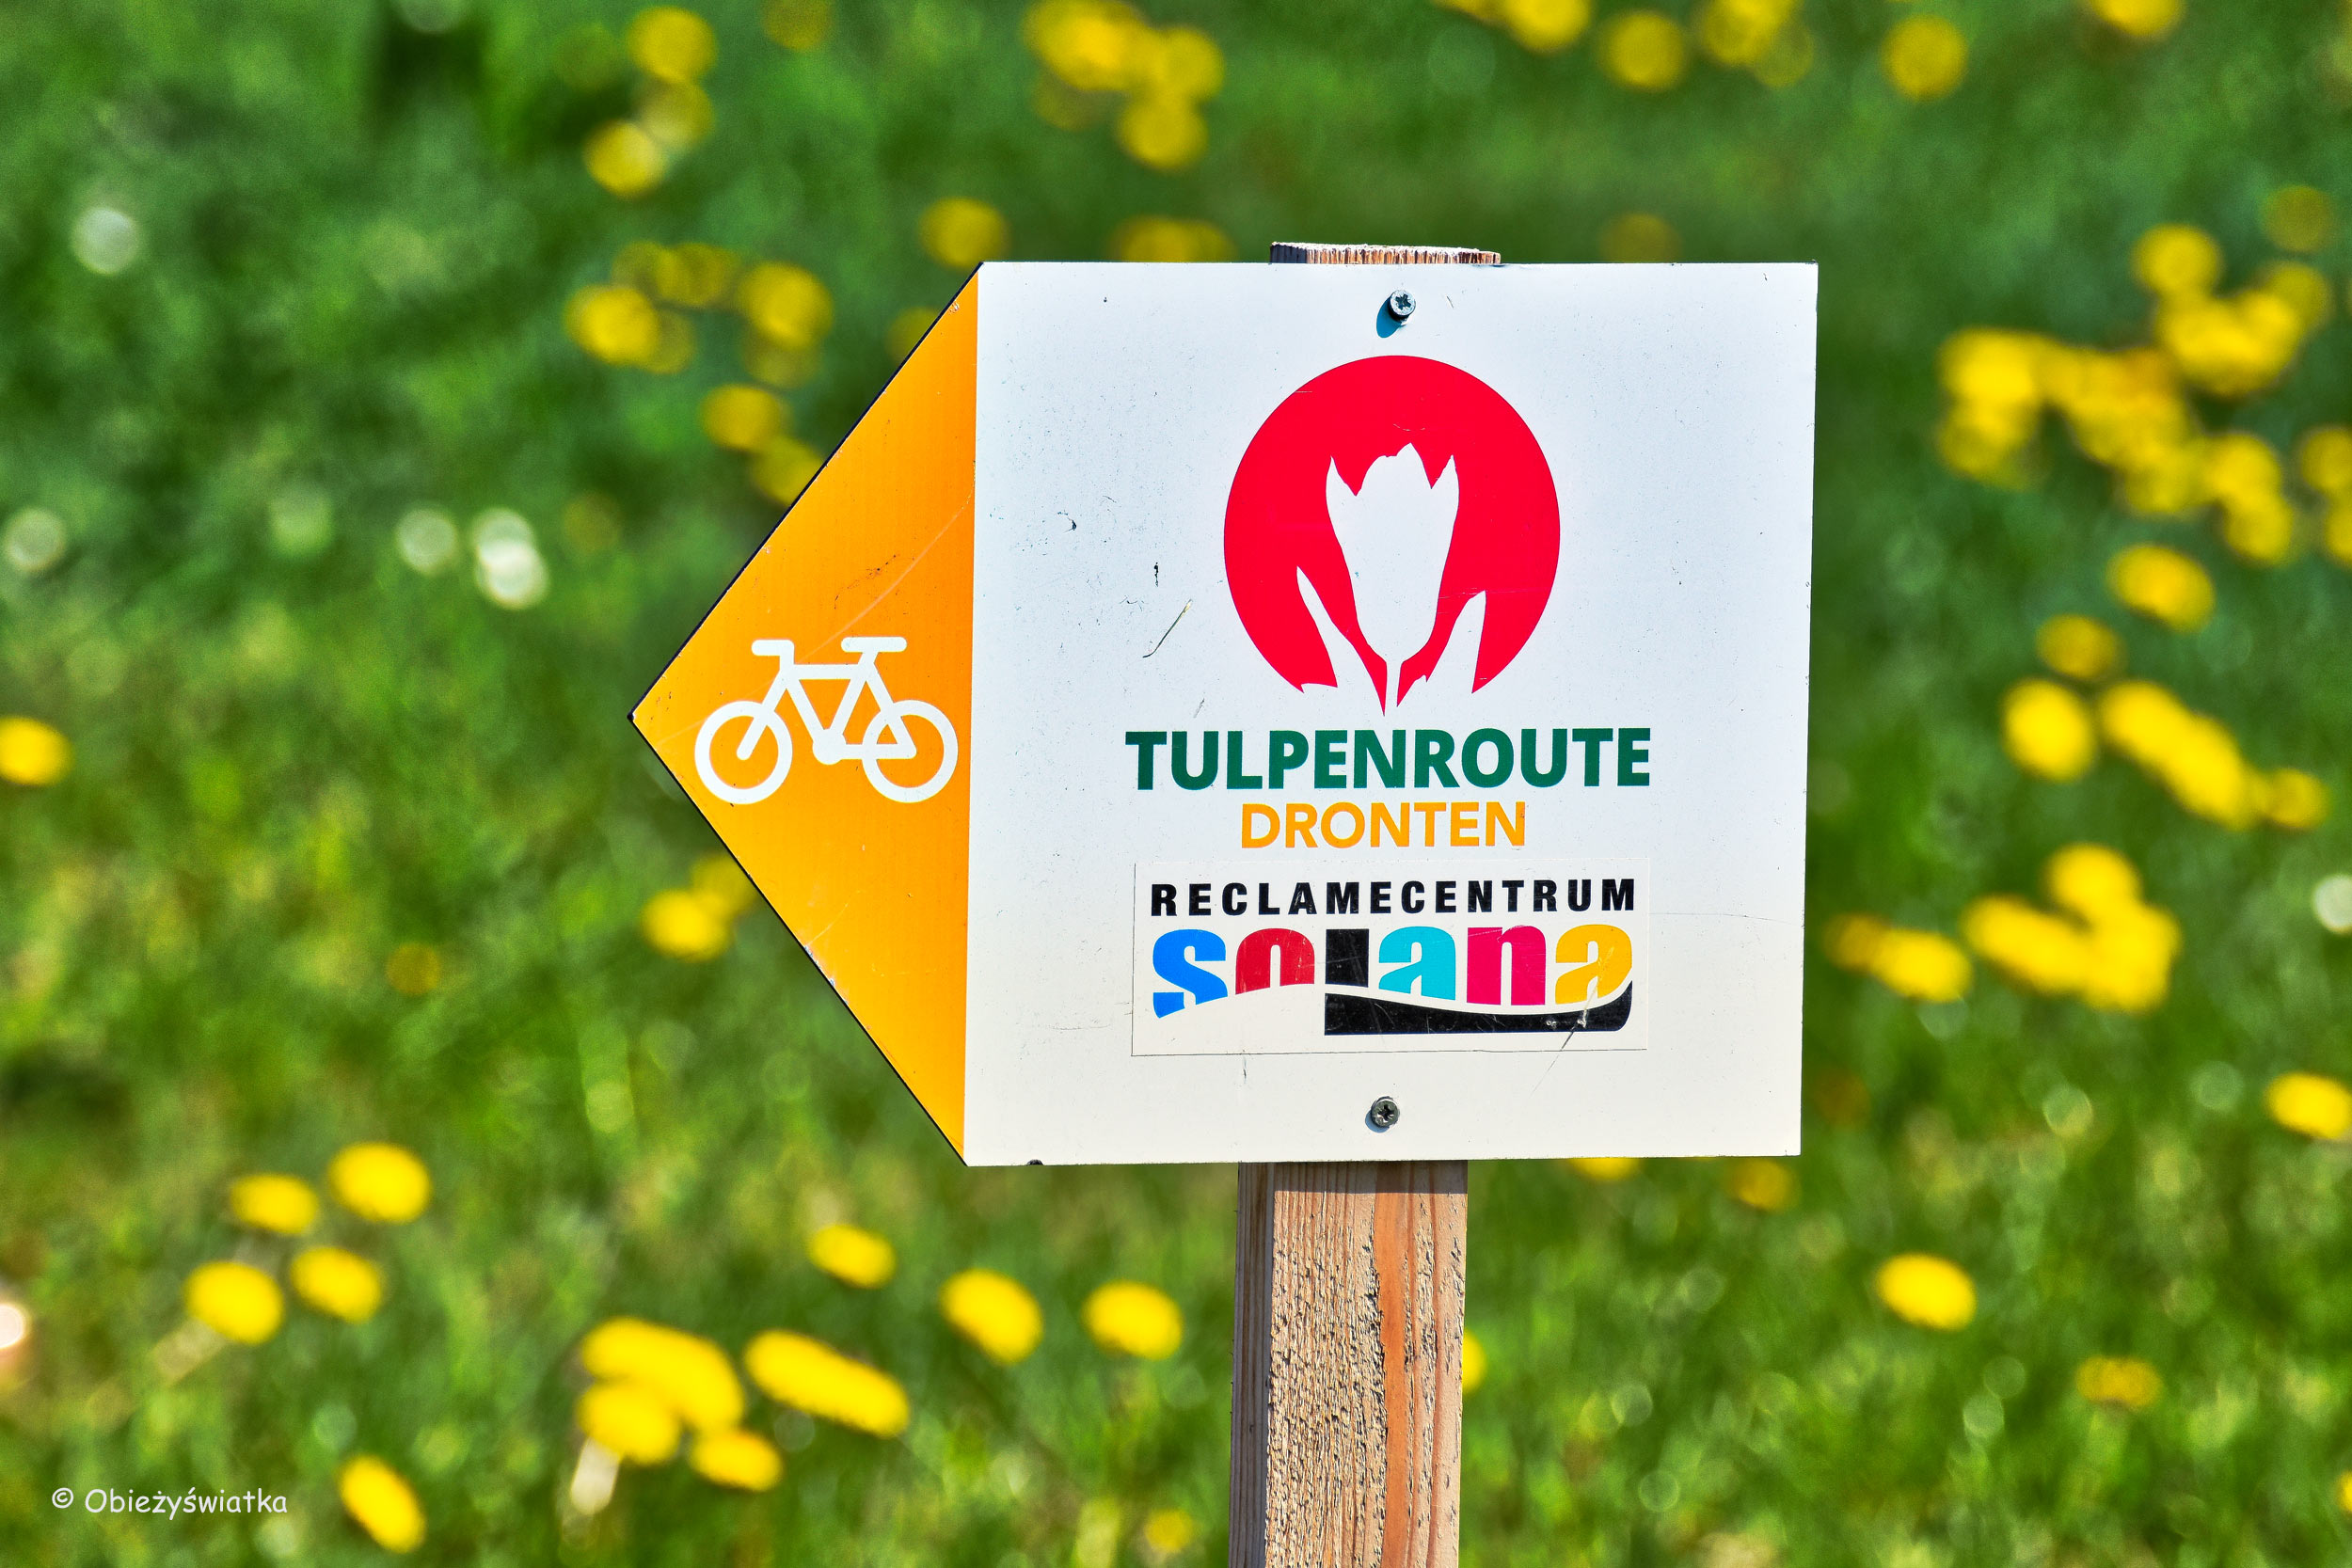 Tulpenroute, Holandia - Tulipanowy szlak